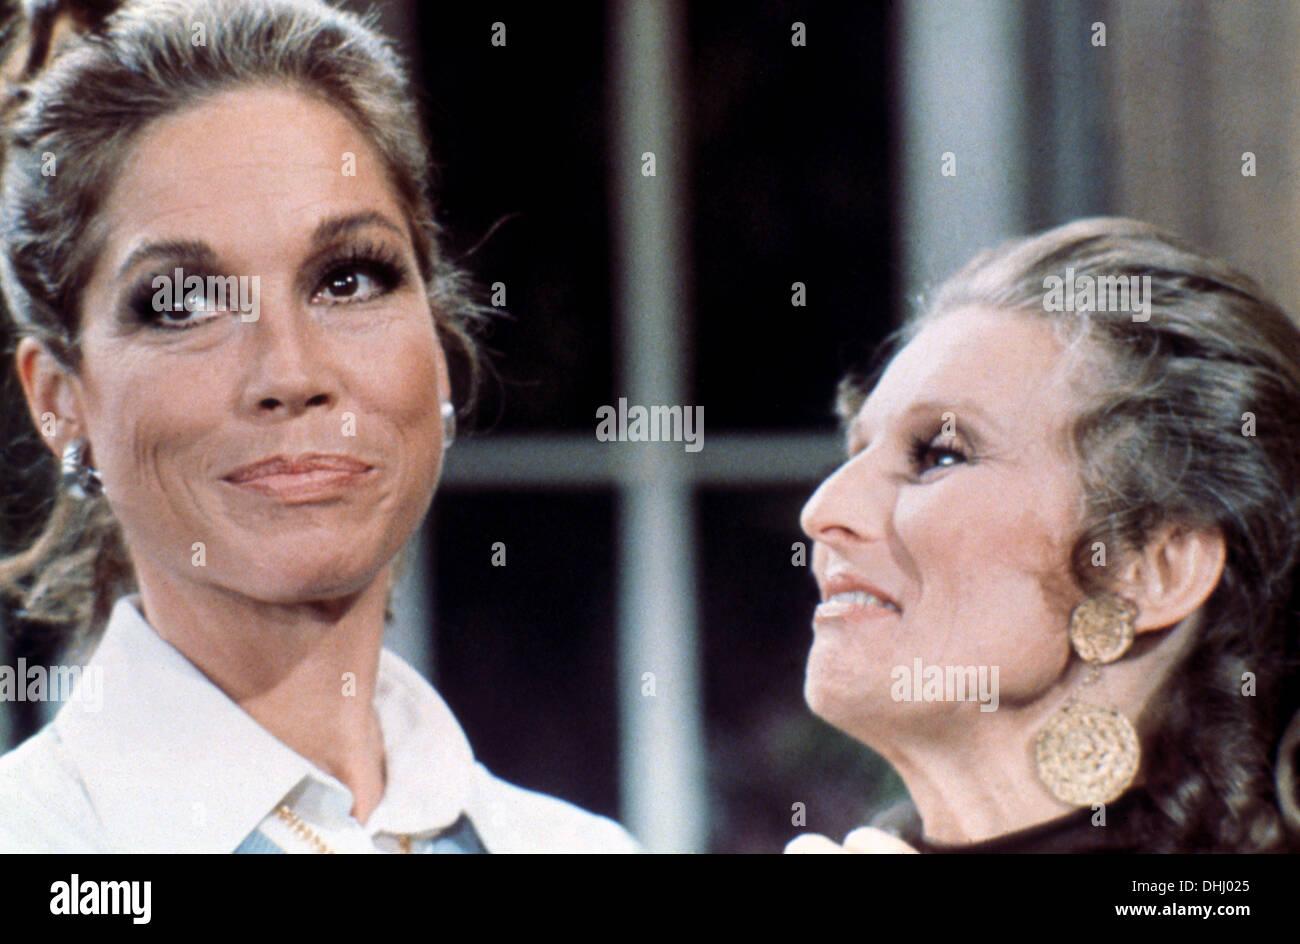 MARY TYLER MOORE SHOW (TV) (1970-1977) MARY TYLER MOORE, CLORIS